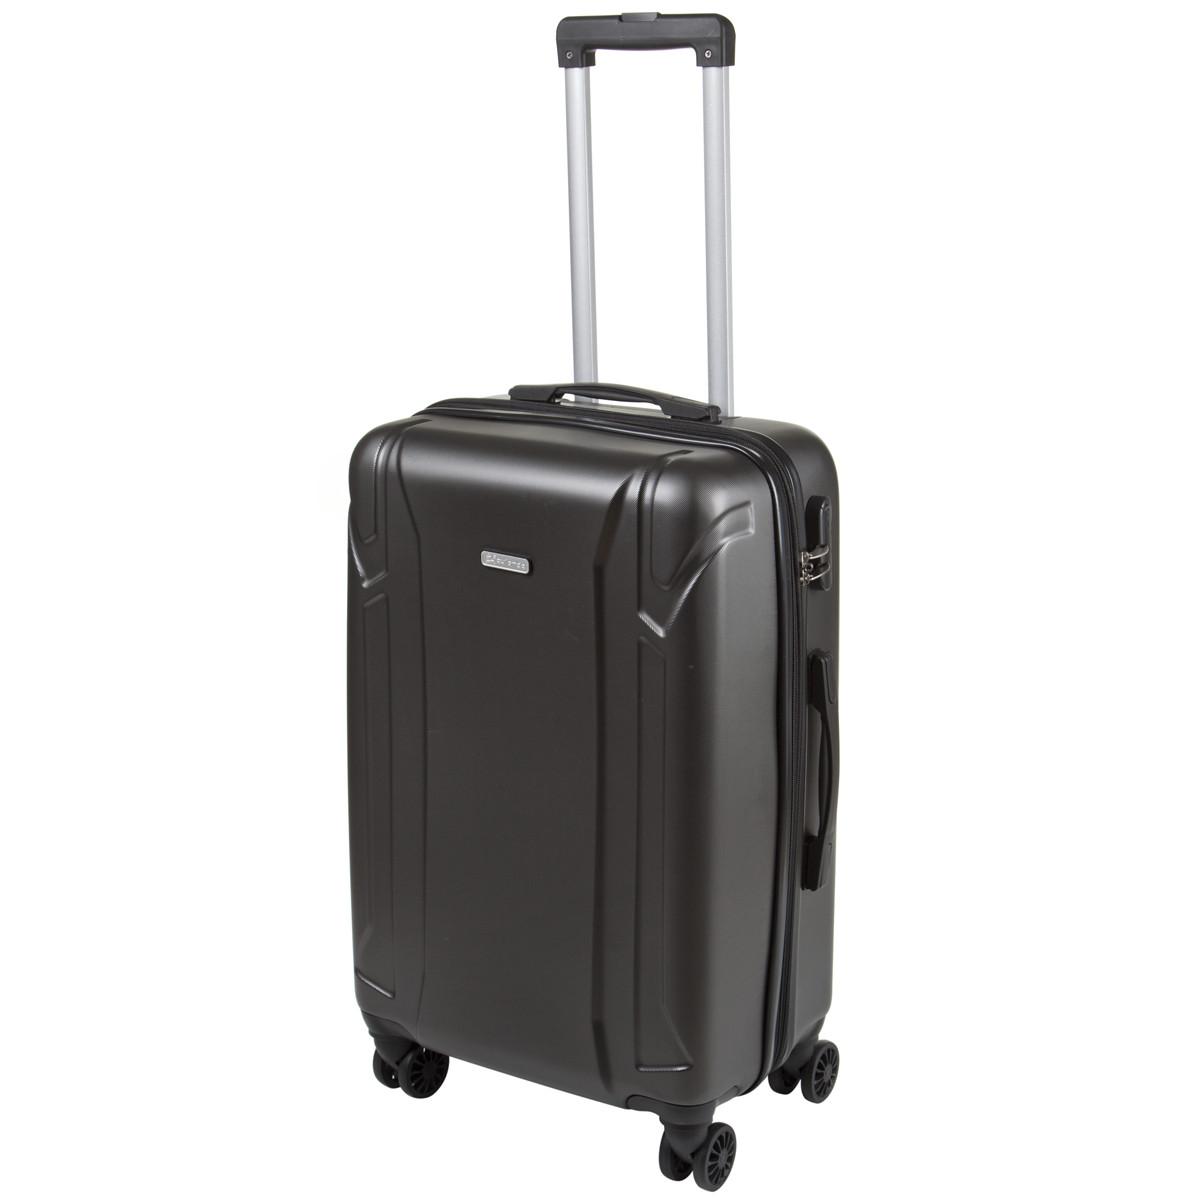 Чемодан с расширением средний ОULANDO пластик ABS 4 колеса 43х68х26(+3) тёмно-серый  ксЛ722-24тсер